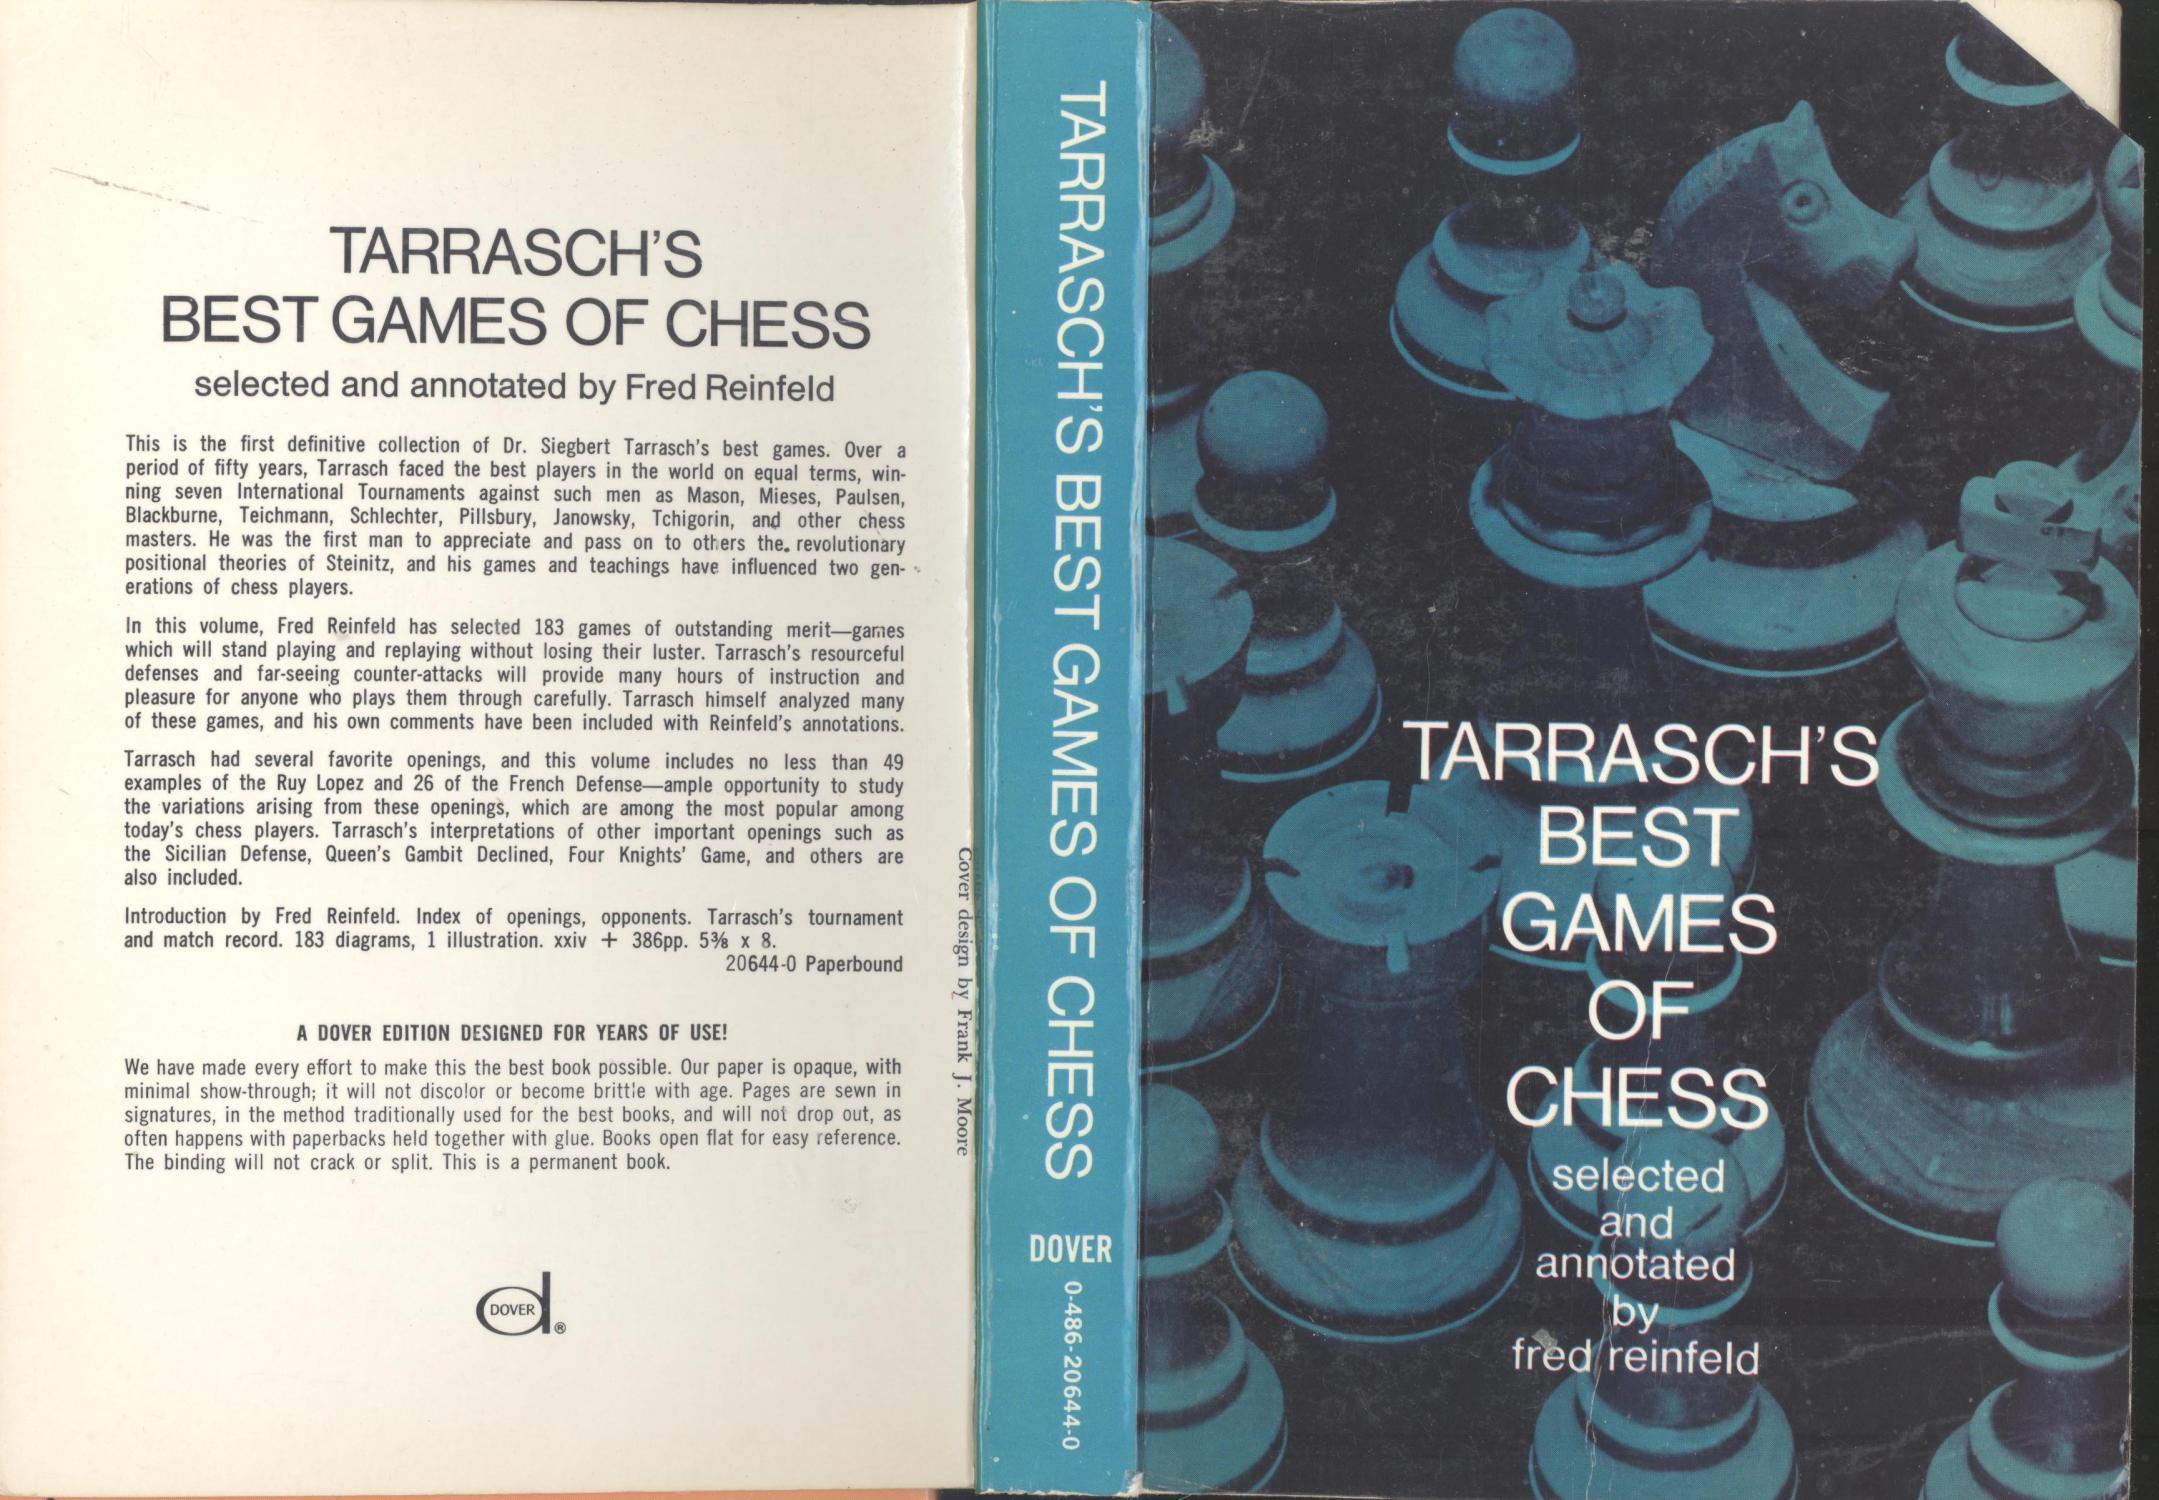 Joseph Valles Books Abebooks 1979 Checkmate Wiring Diagram